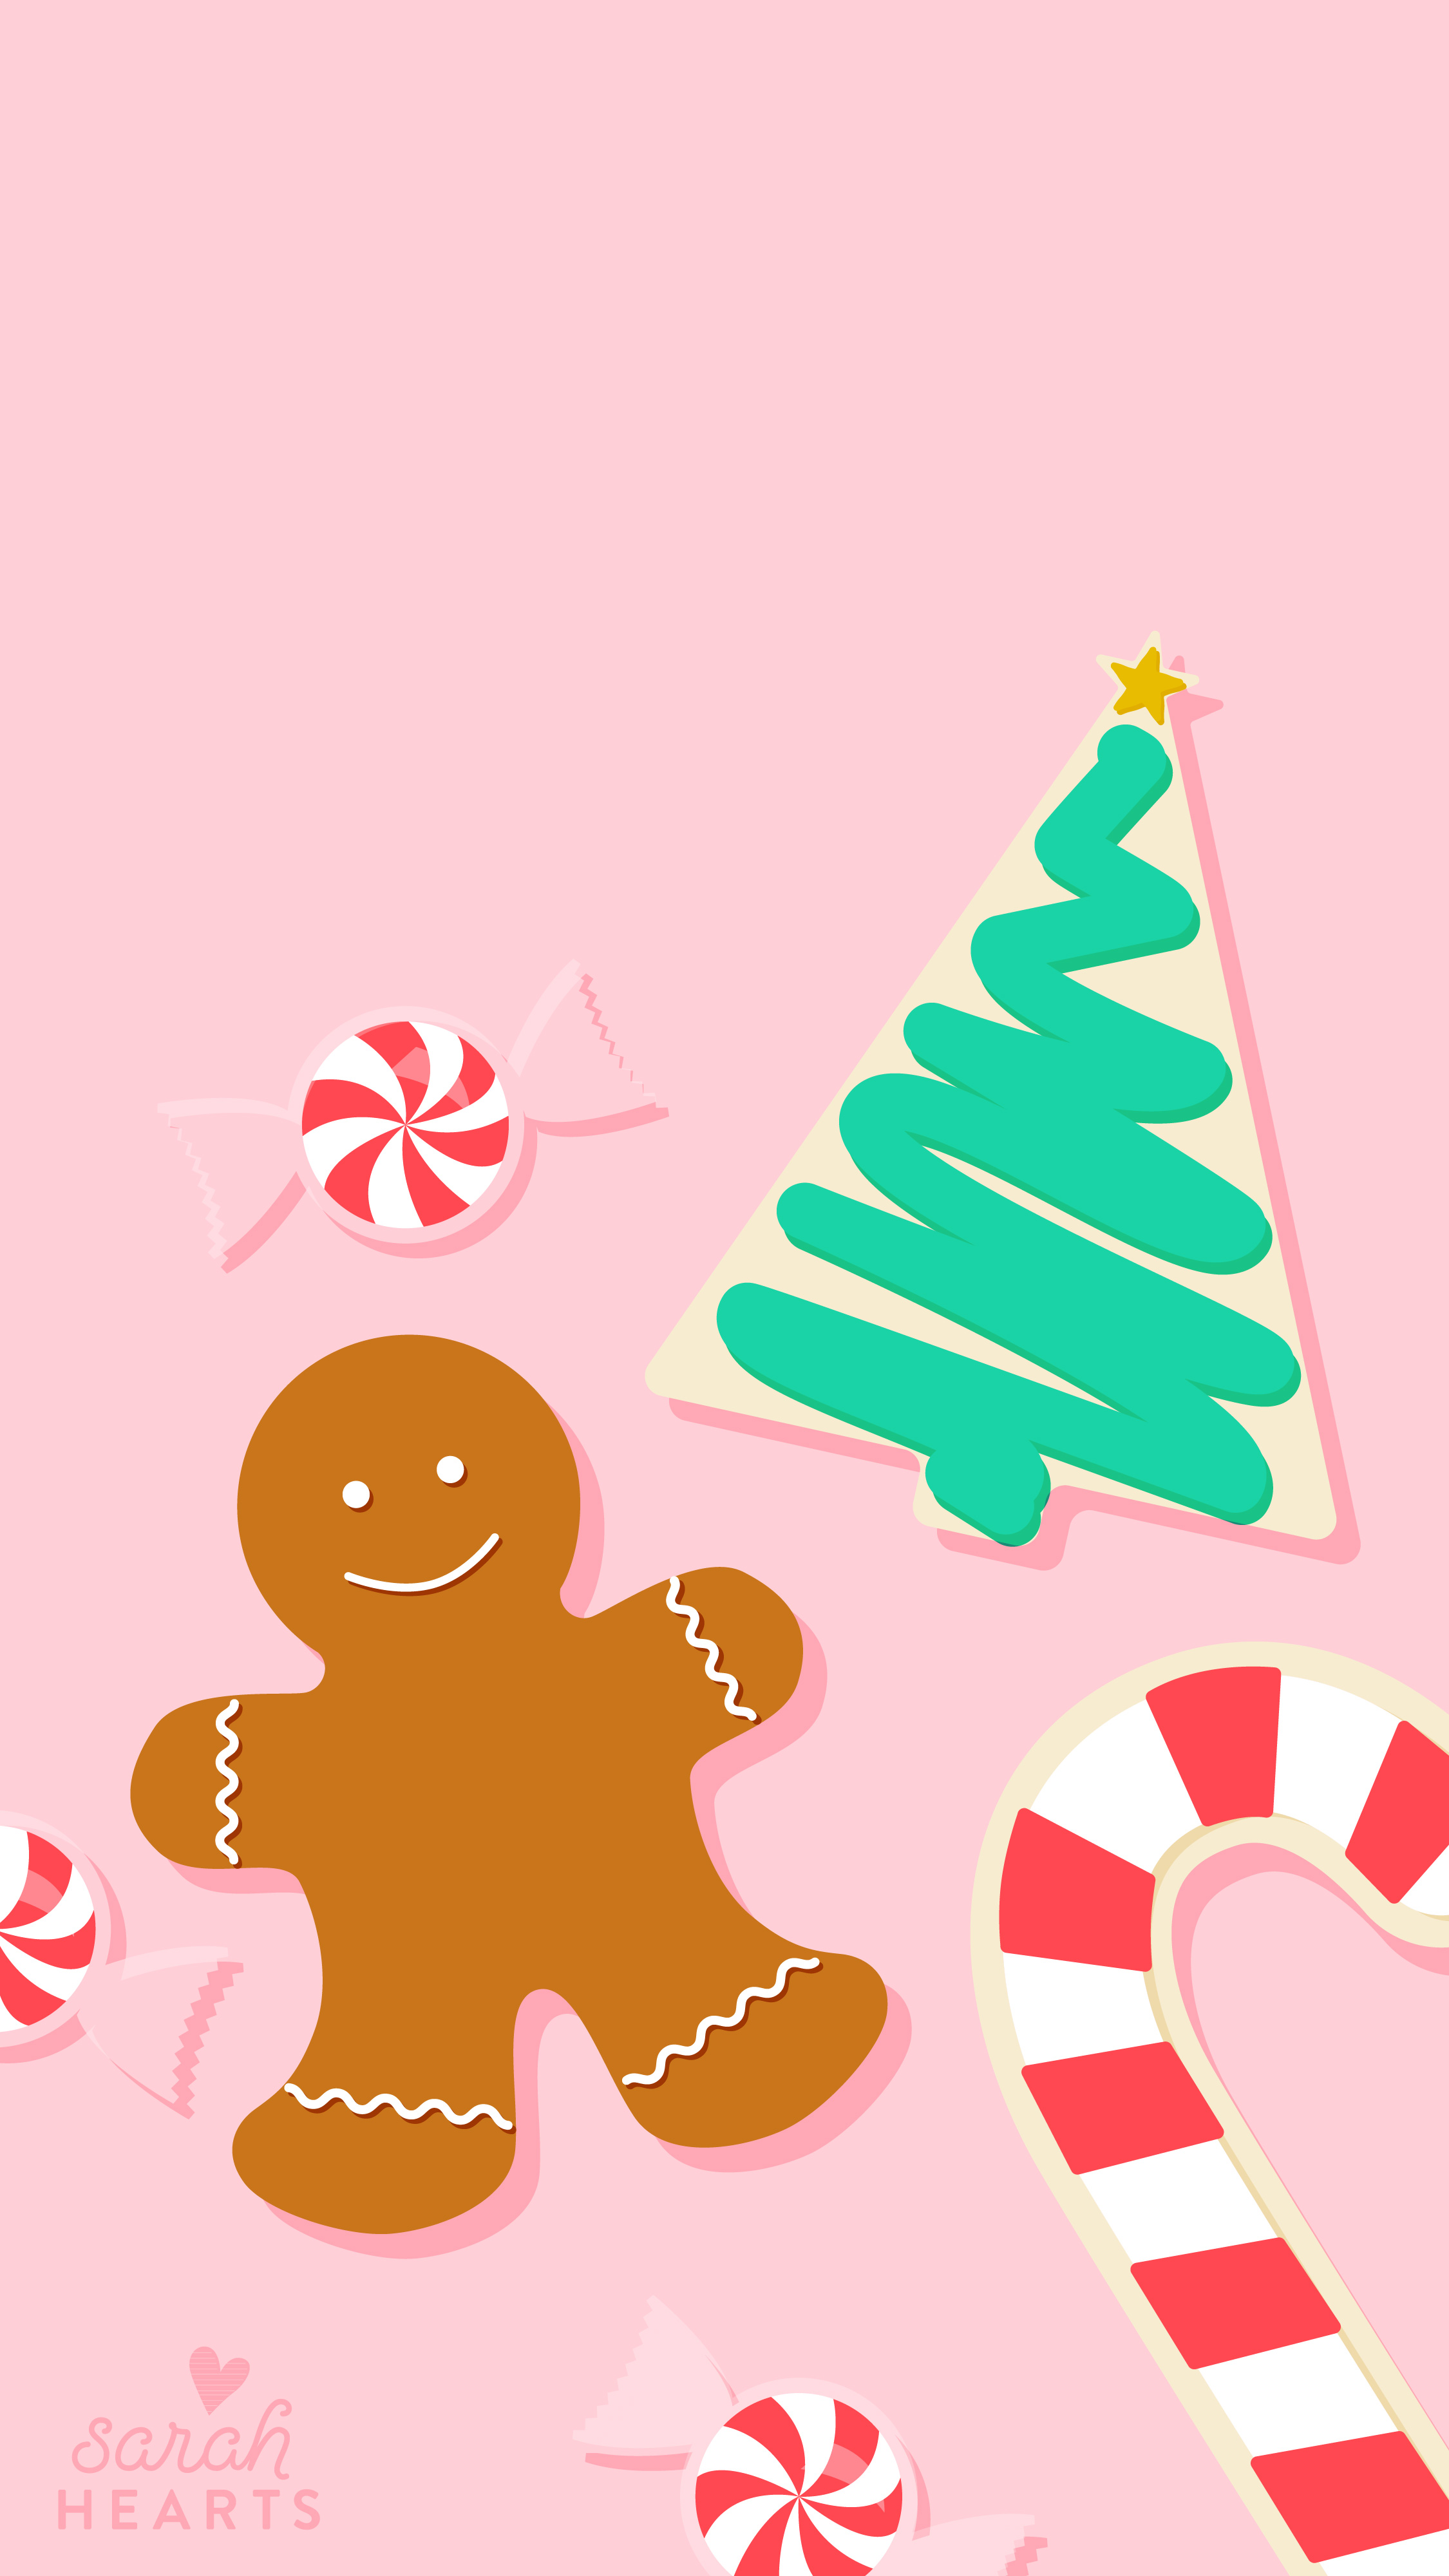 I Want To Believe Wallpaper Iphone December 2016 Christmas Cookie Calendar Wallpaper Sarah